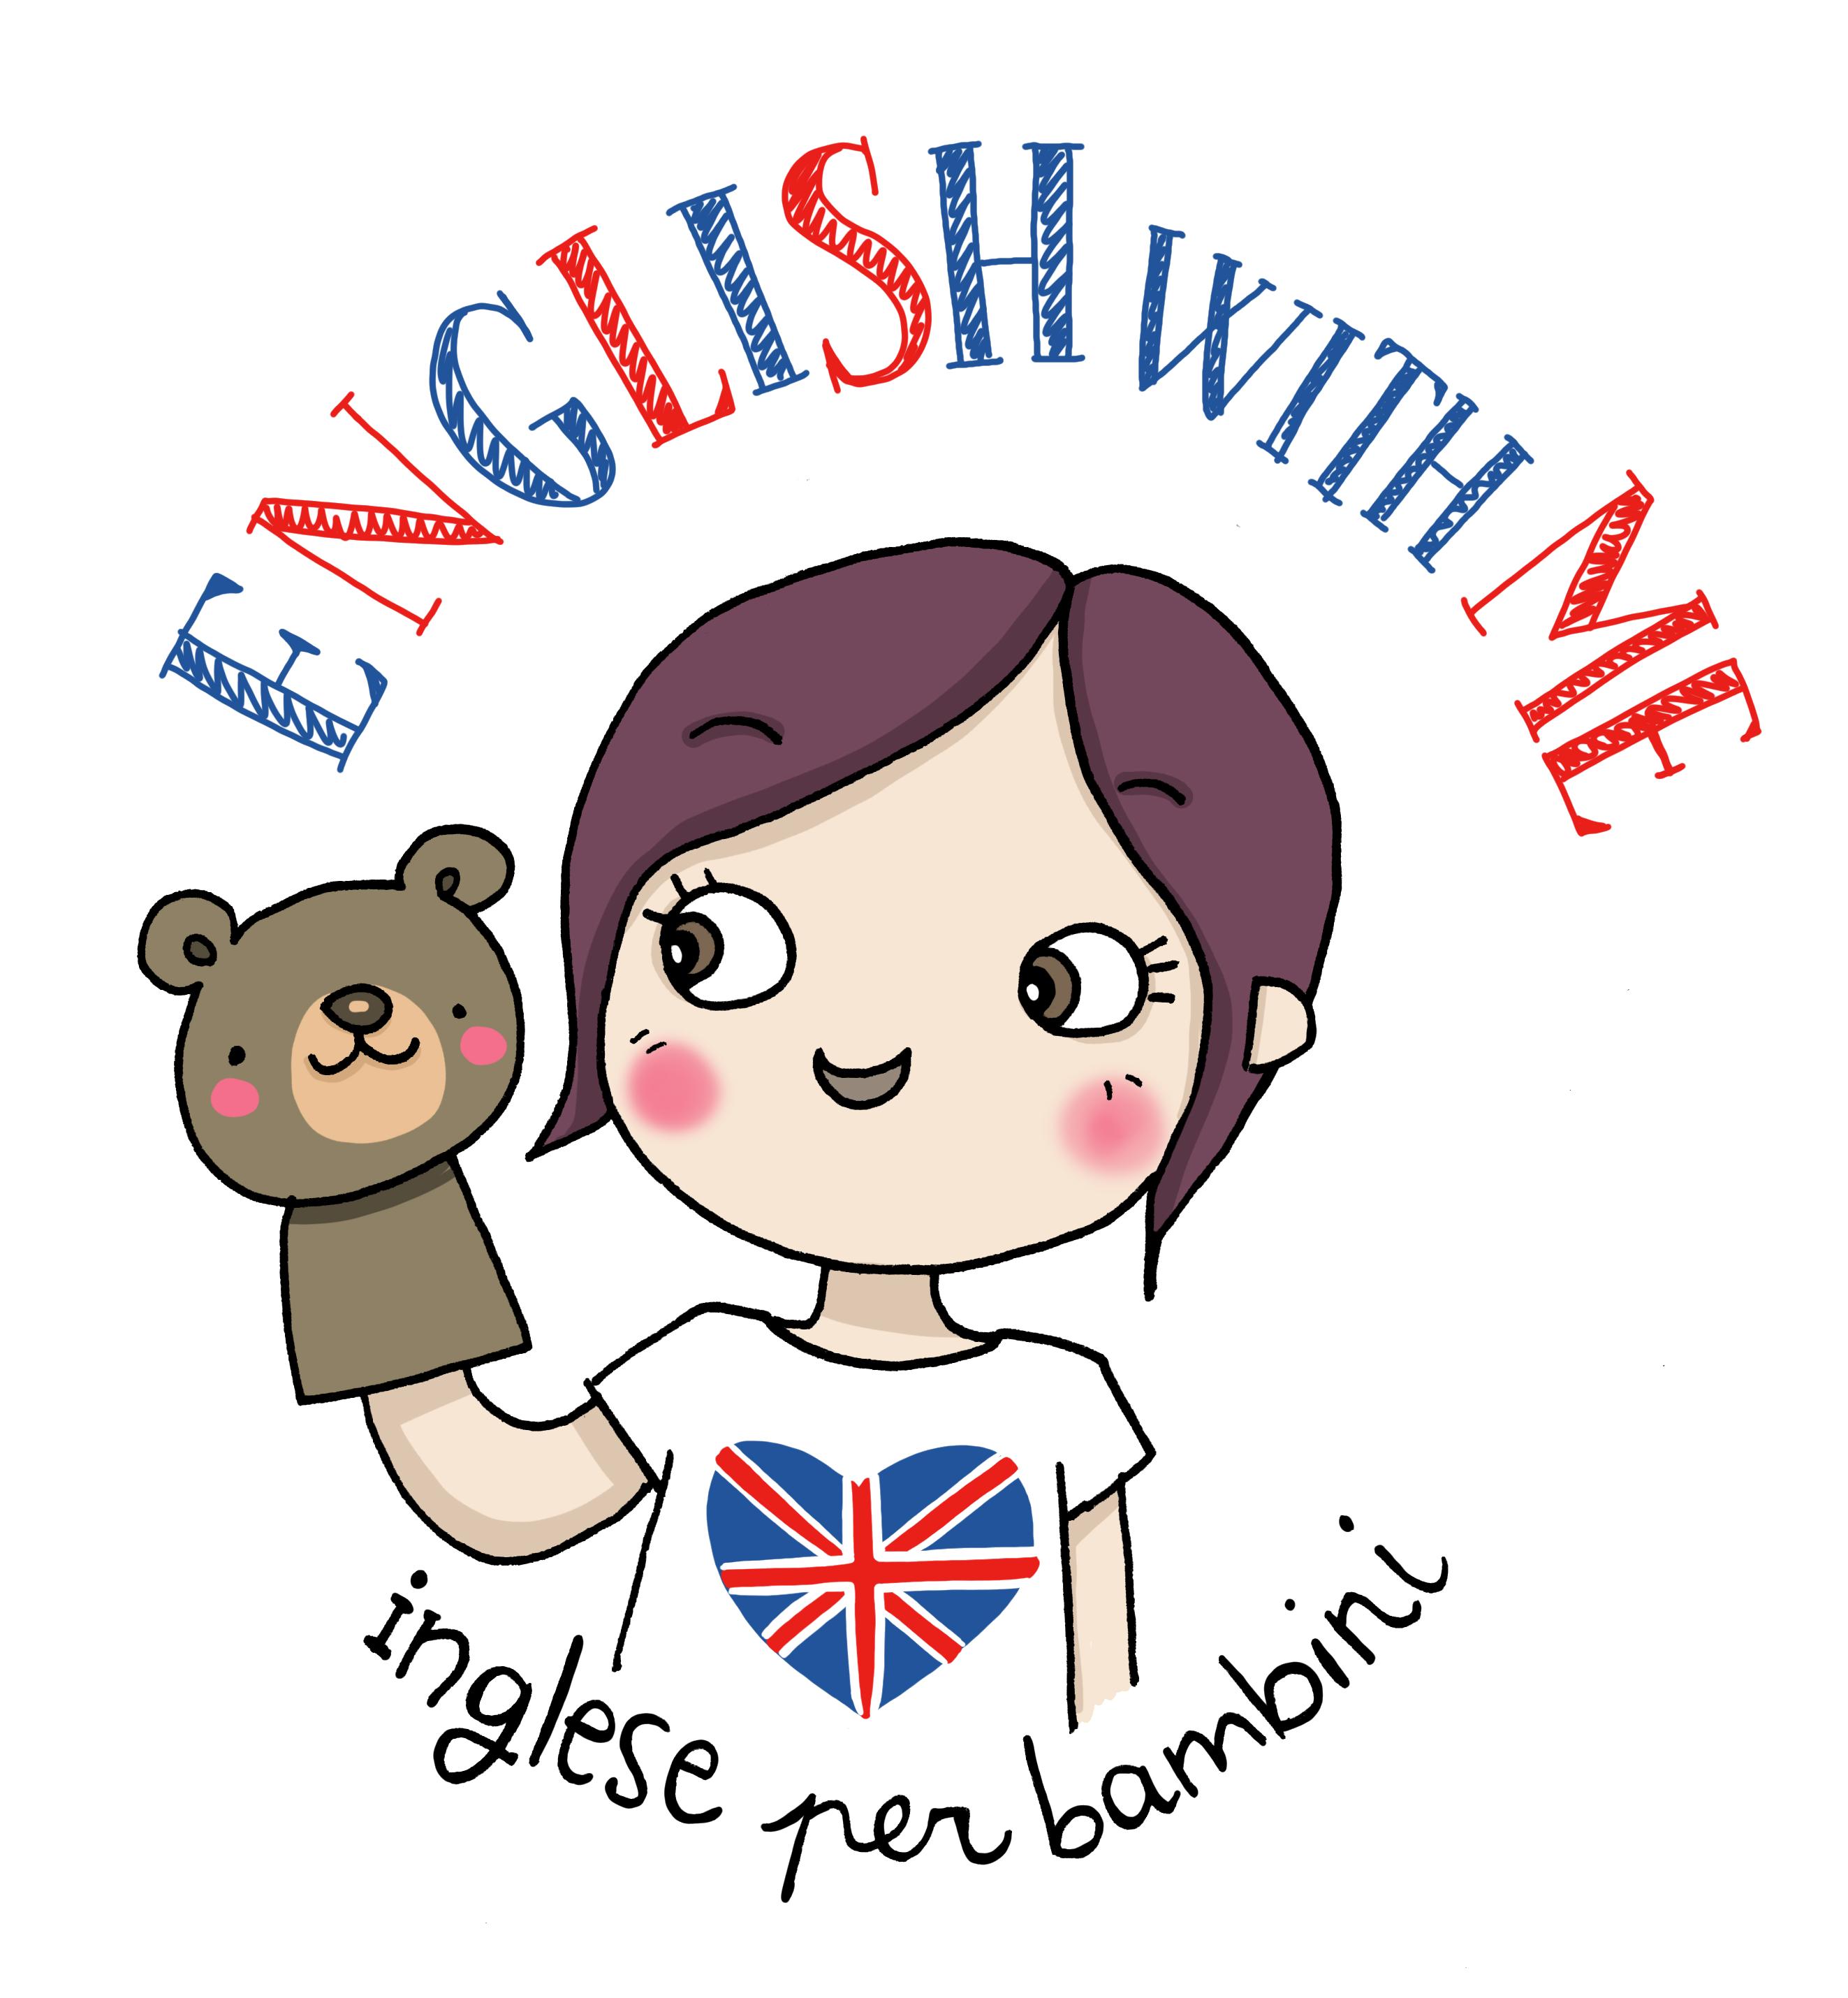 English with me